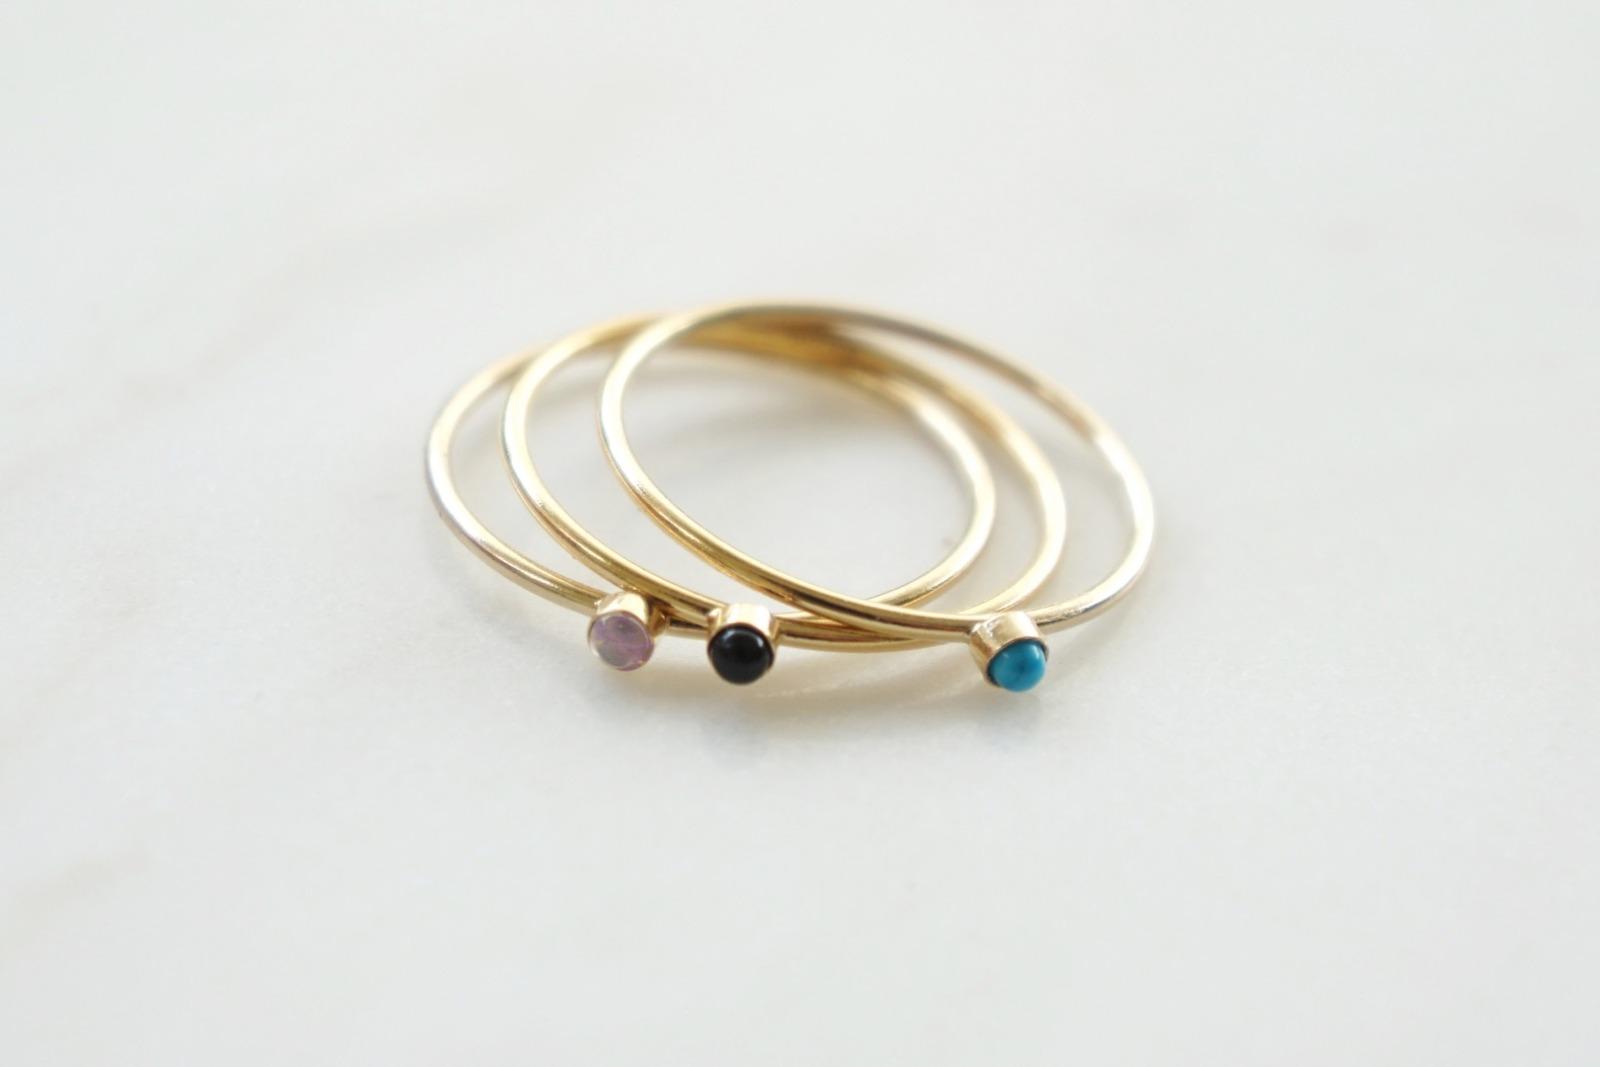 Zierlicher Ring Stapelring vergoldet Rosa Opal Fassung - 2